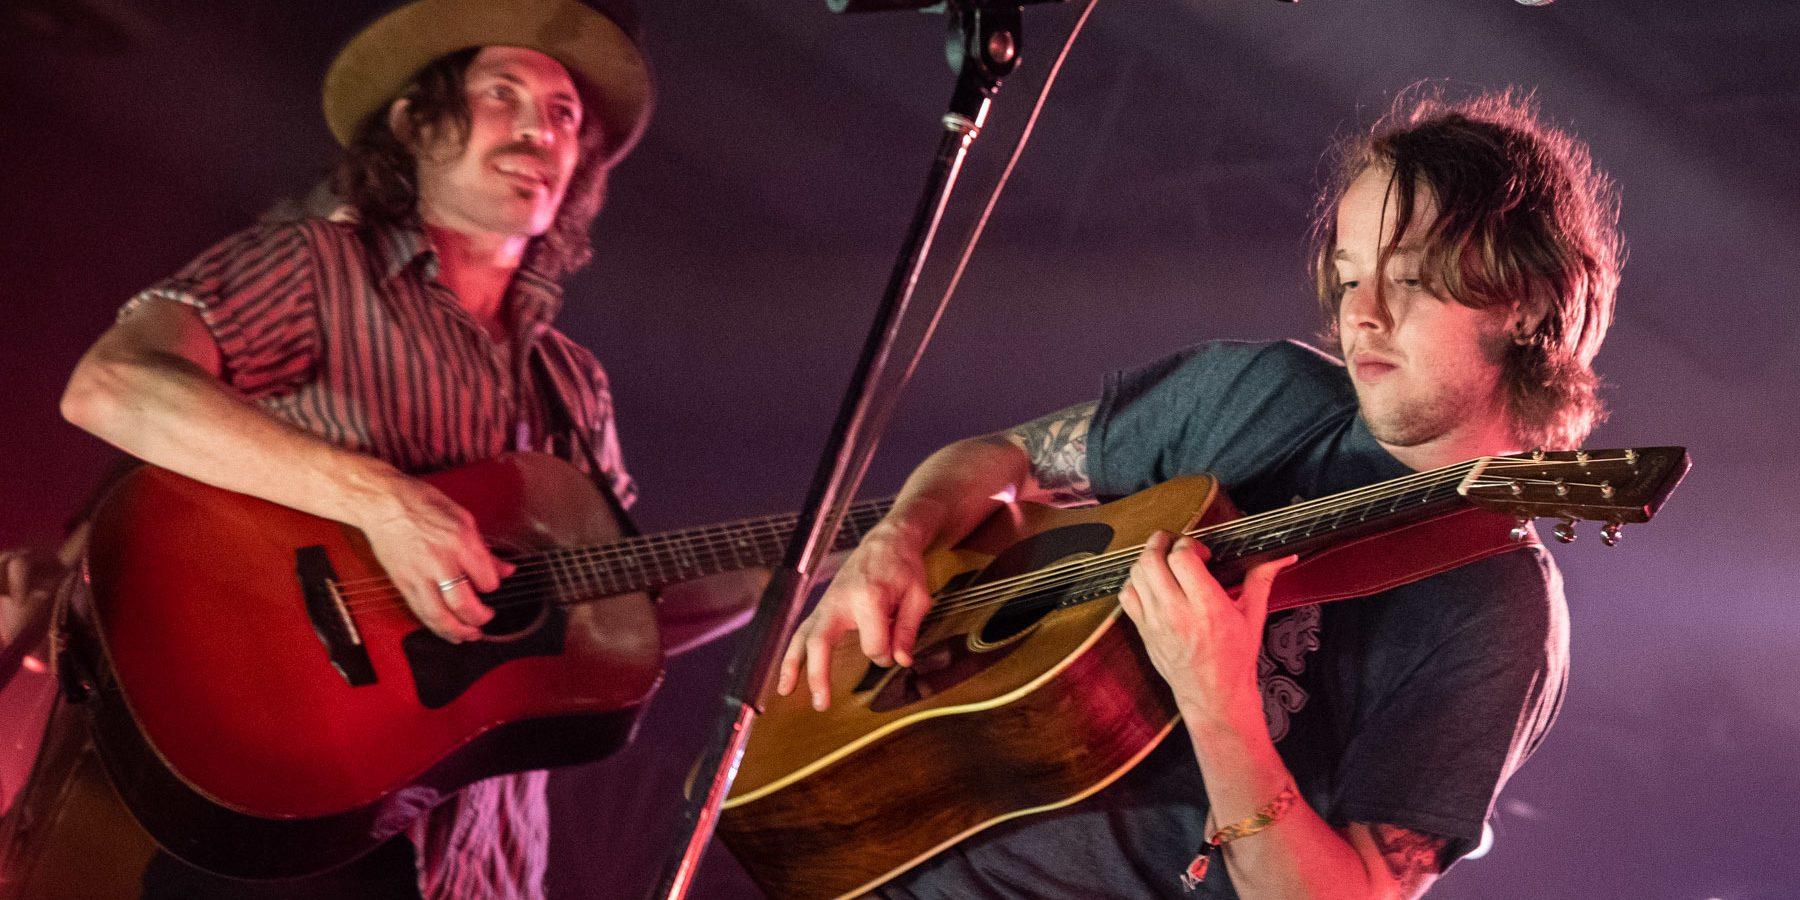 Billy Strings Photo by Mark Raker